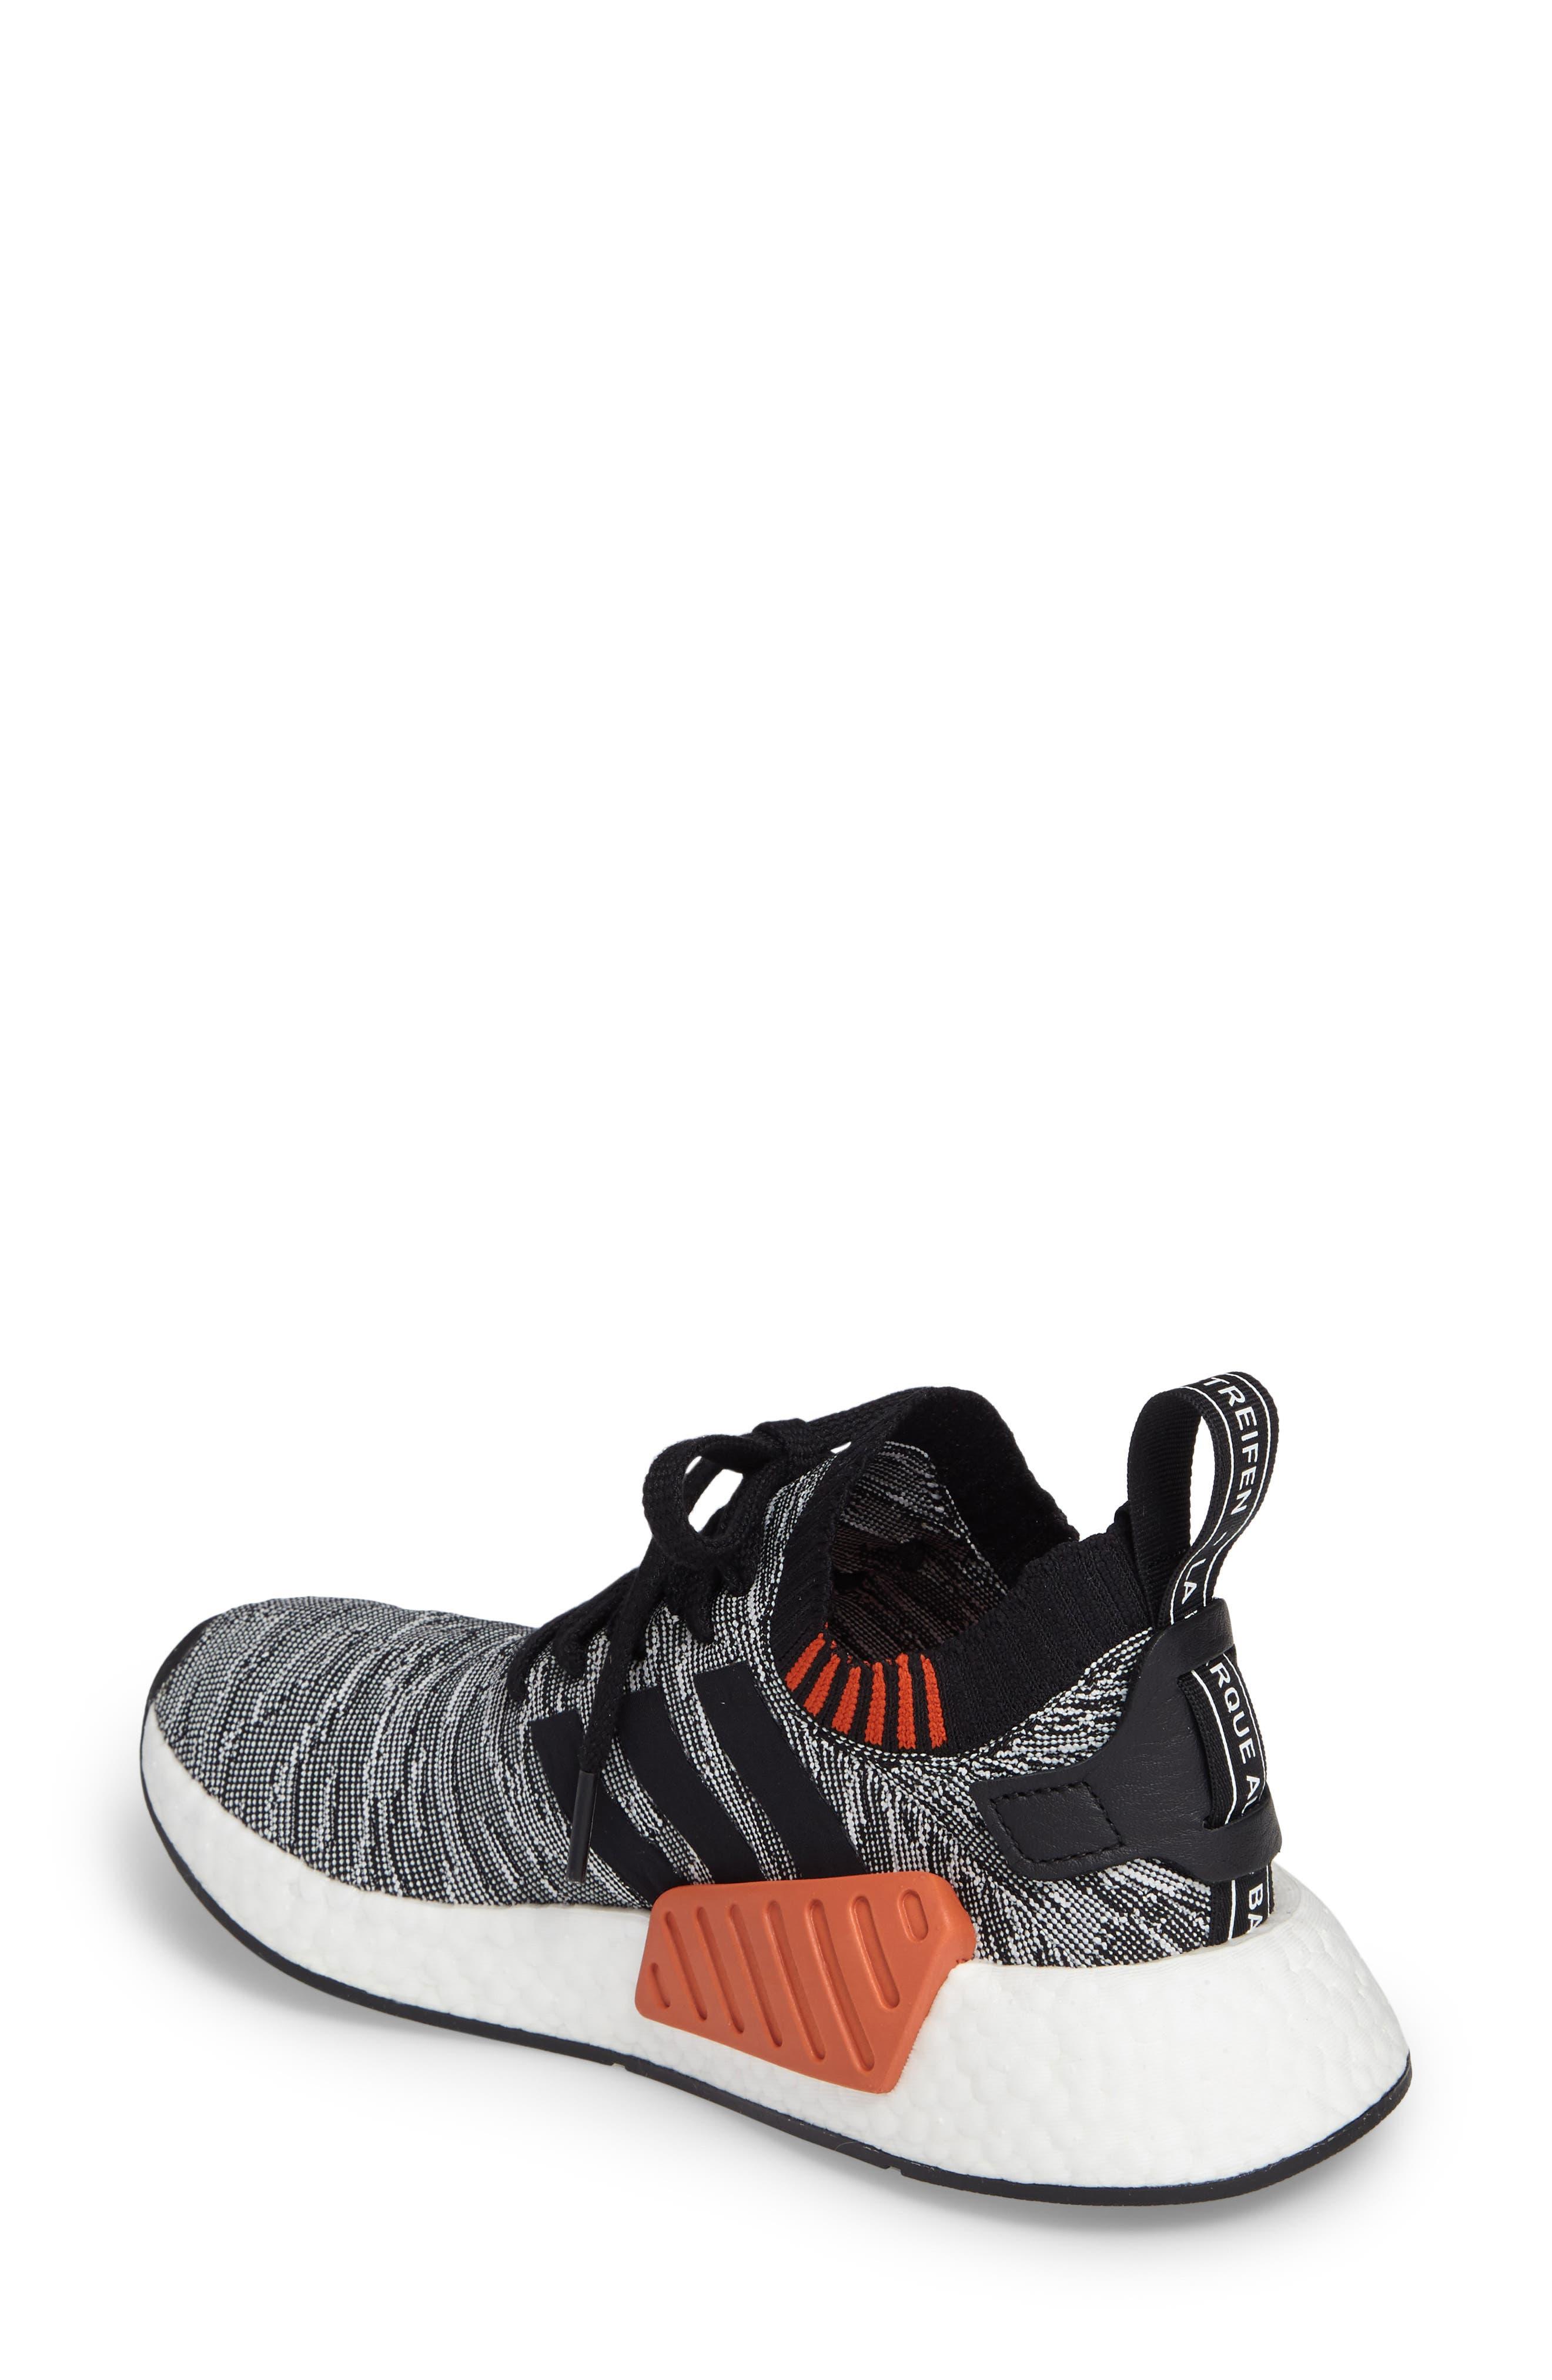 NMD R2 Primeknit Athletic Shoe,                             Alternate thumbnail 7, color,